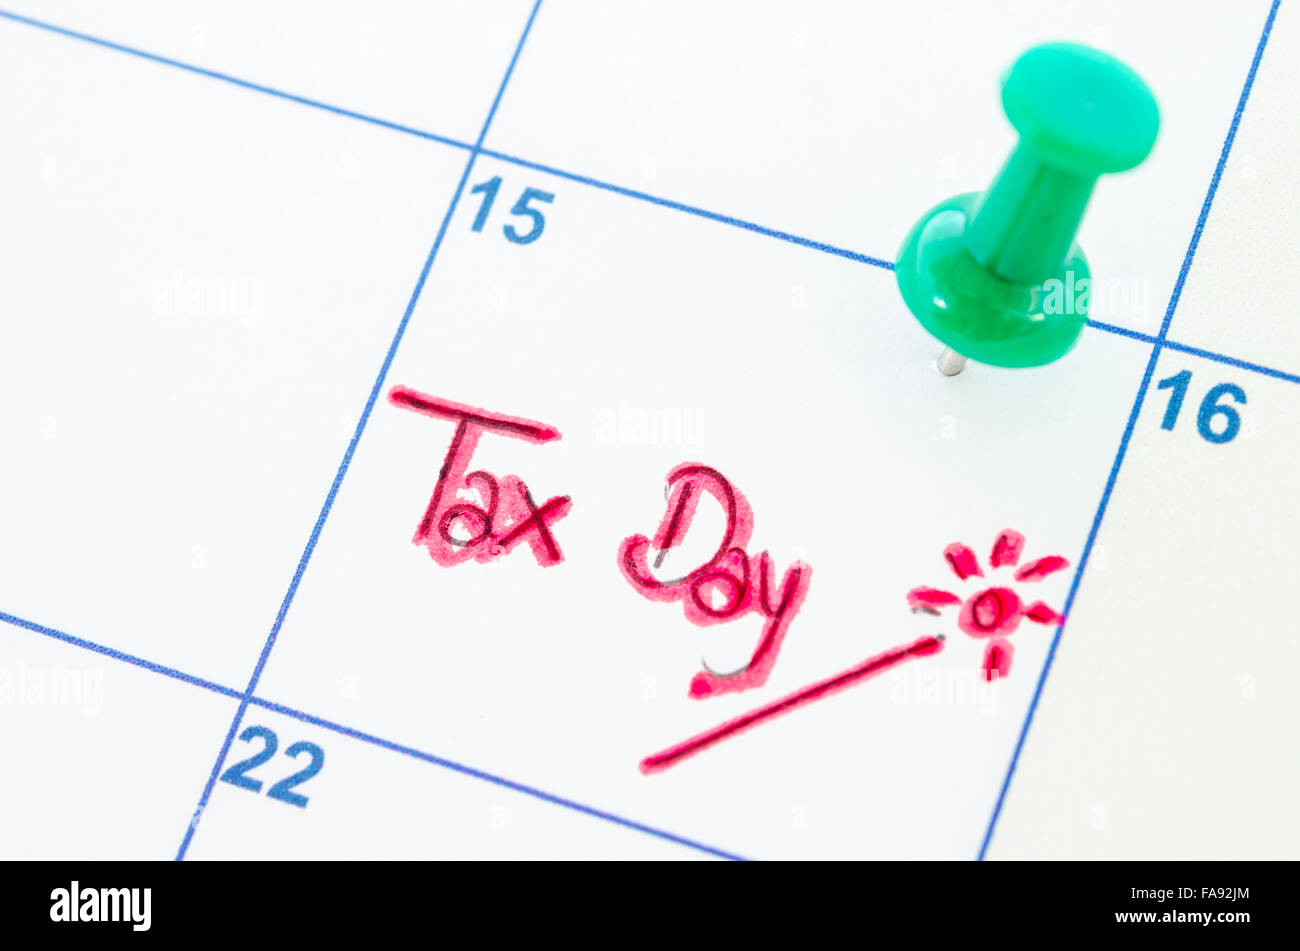 Tax day wording on calendar. - Stock Image